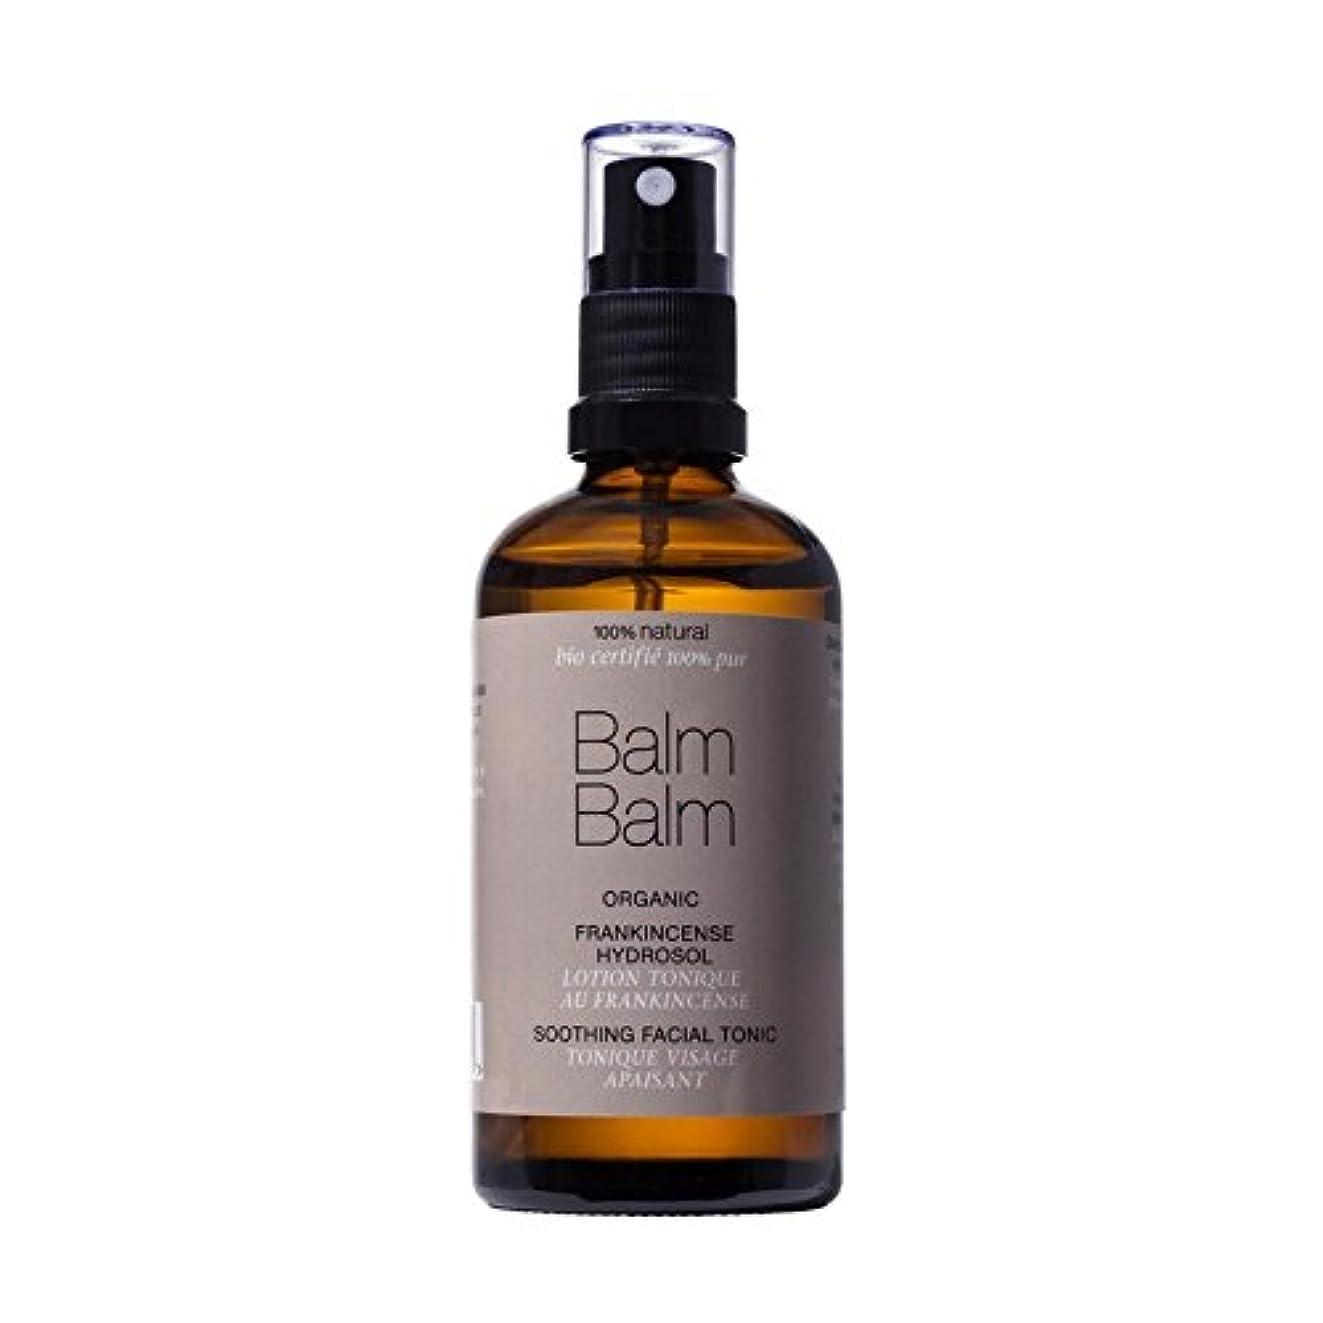 Balm Balm Frankincense Organic Hydrosol Soothing Facial Tonic 100ml - バームバーム乳香有機ハイドロゾルなだめるような顔のトニック100ミリリットル [...